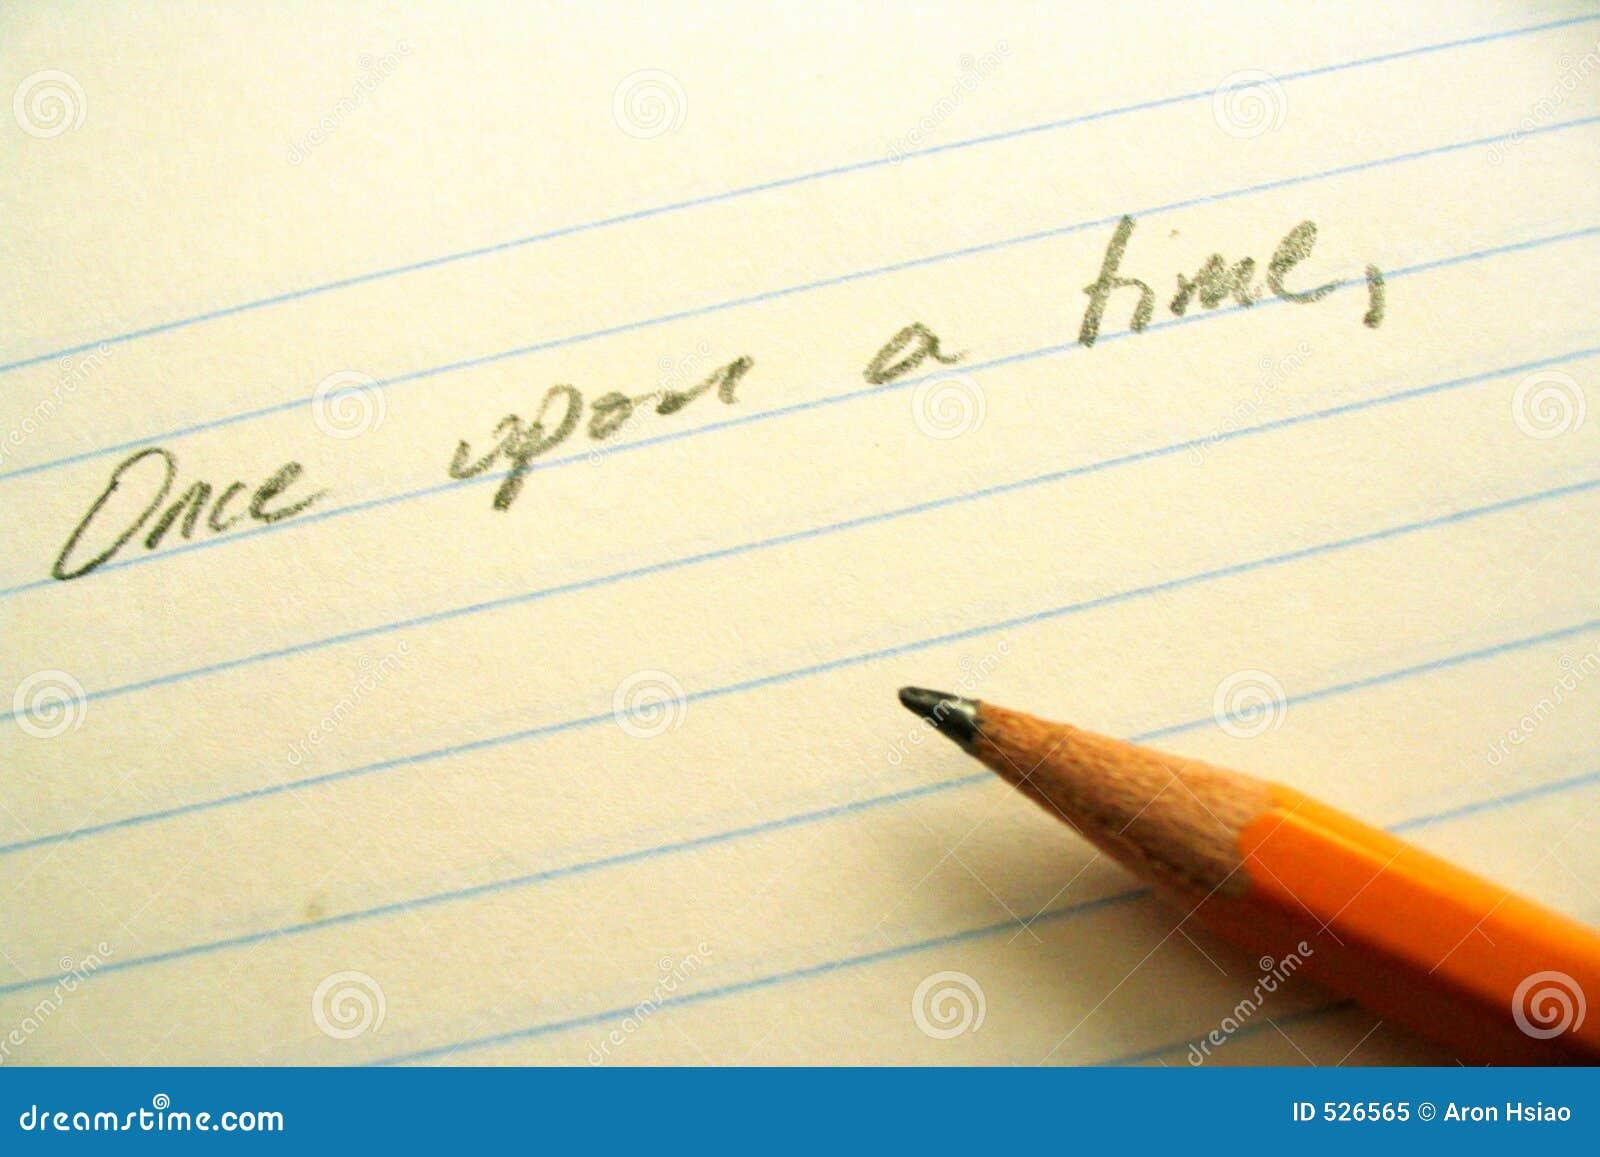 Download 线路空缺数目纸张铅笔 库存图片. 图片 包括有 英语, artsiest, 文字, 条款, 编写的, 构成, 排行 - 526565